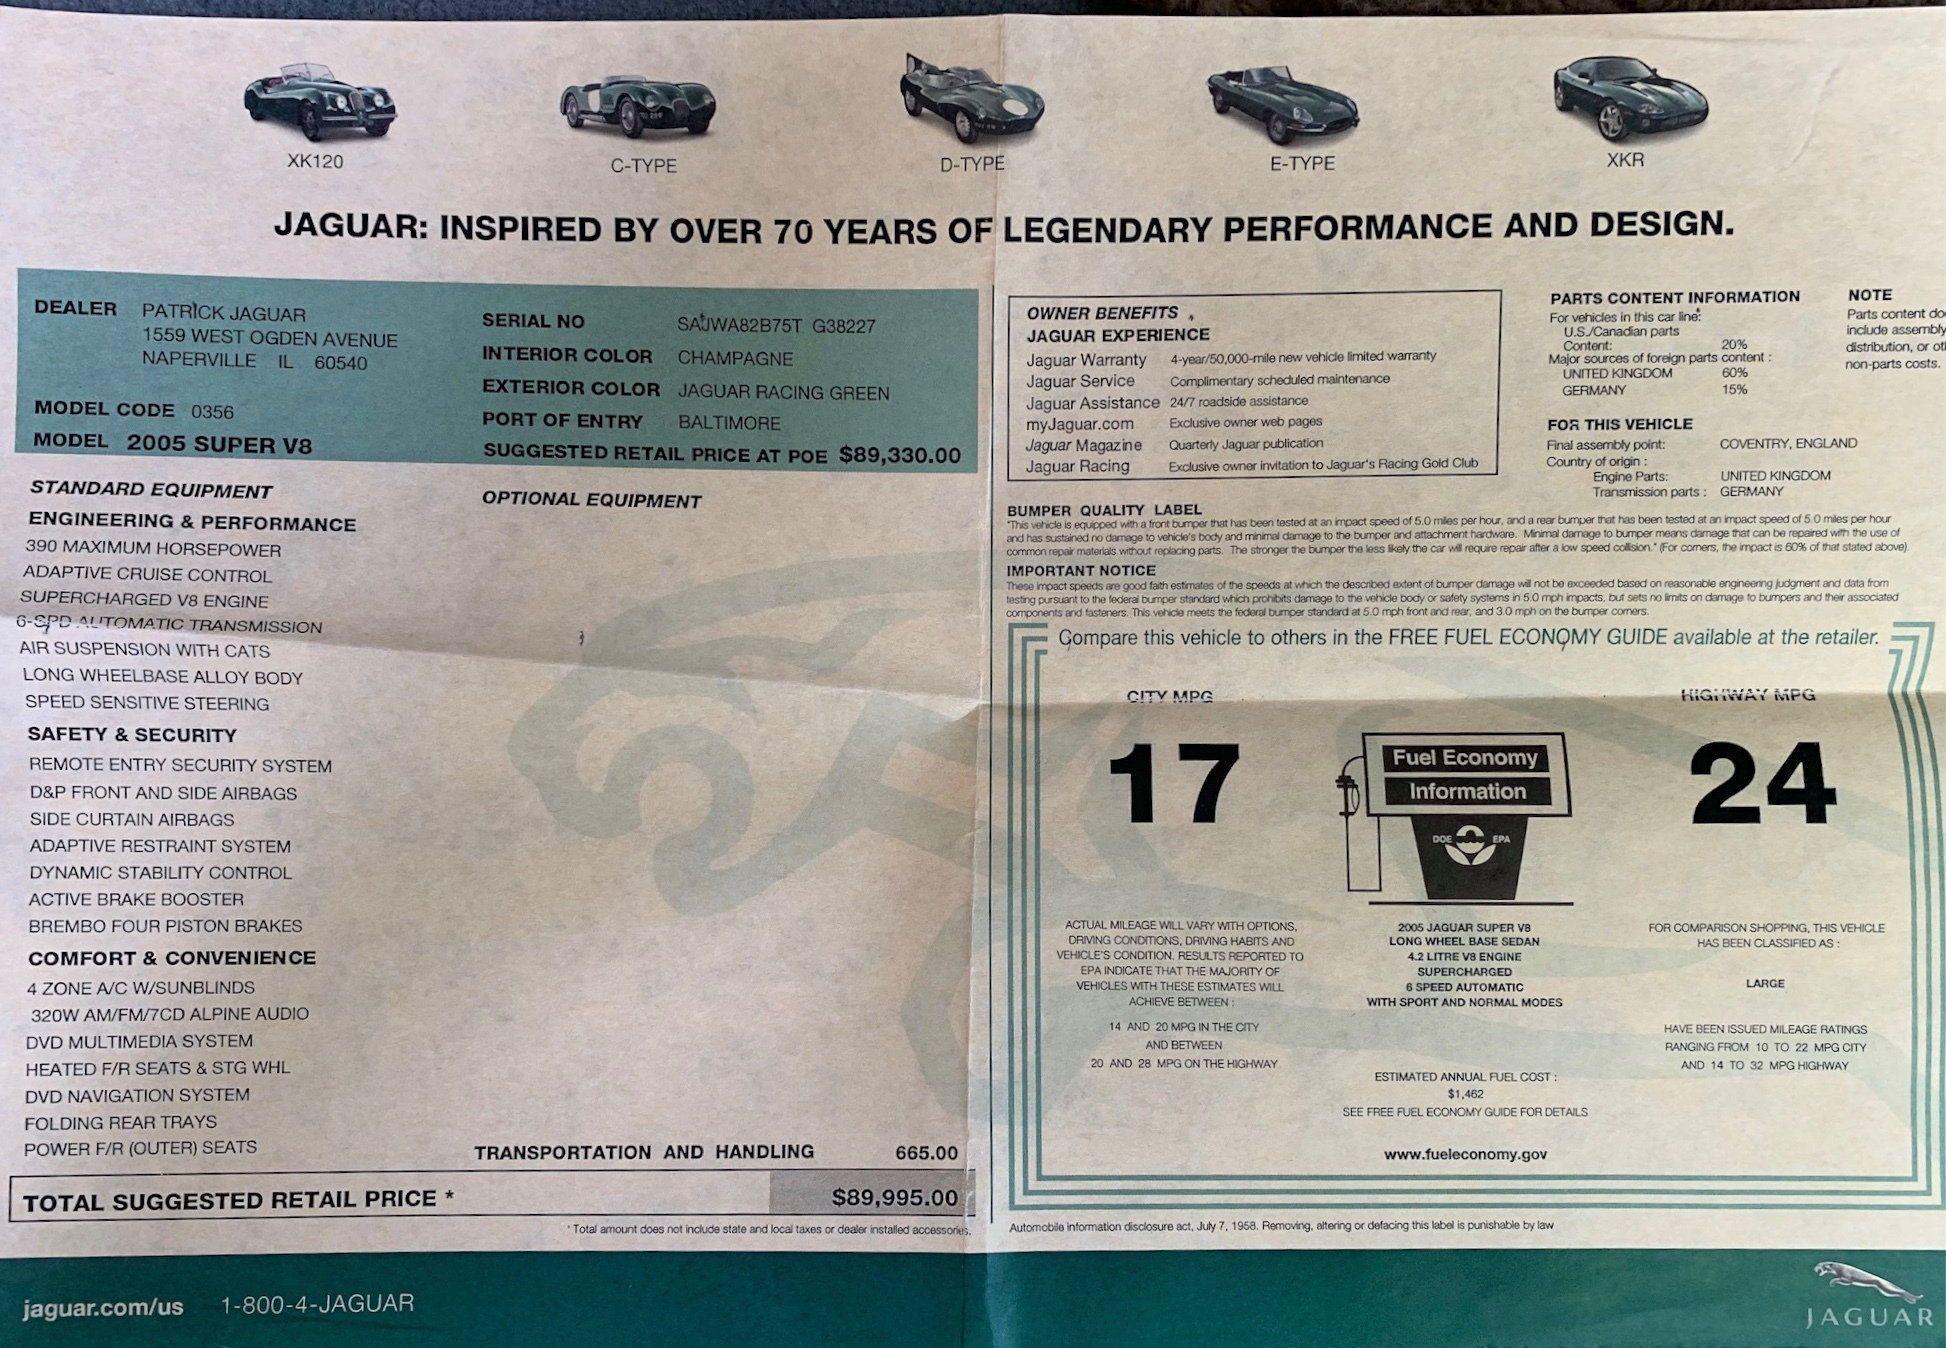 2005 Jaguar Super V8 | Jaguar, Jaguar f type, Color race